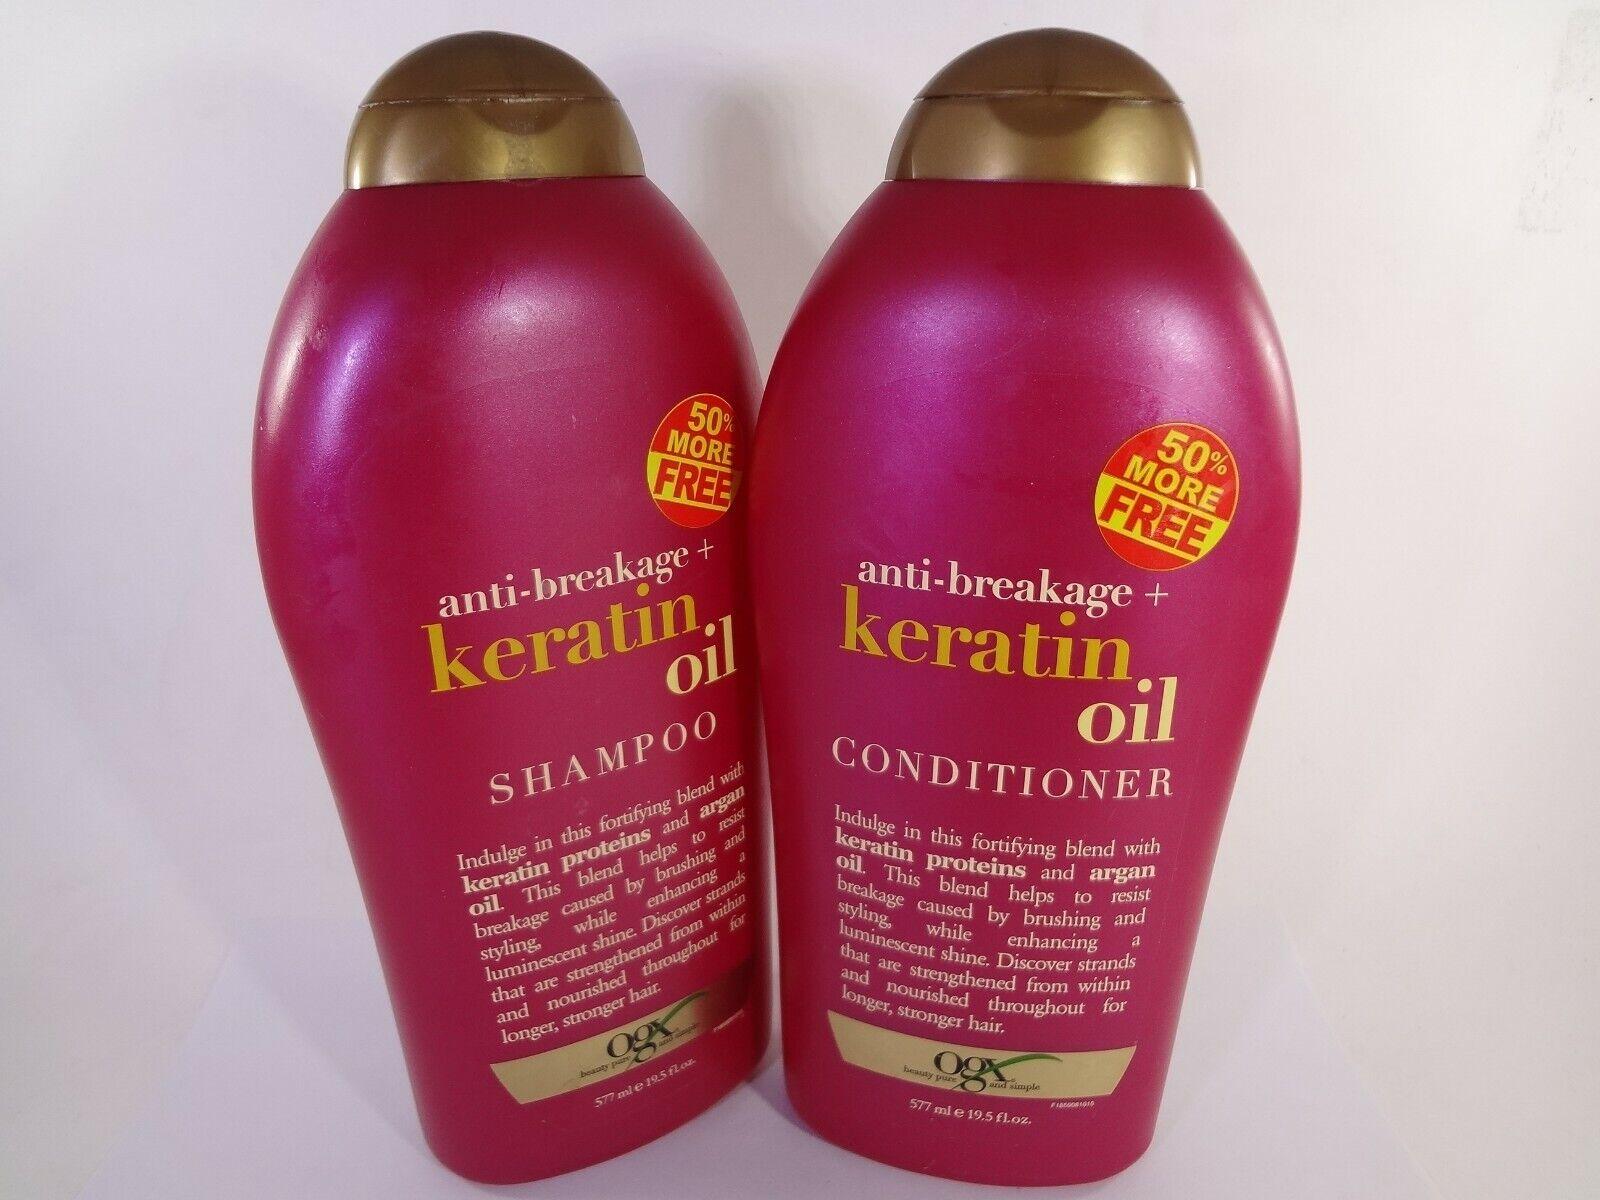 anti breakage keratin oil shampoo and conditioner